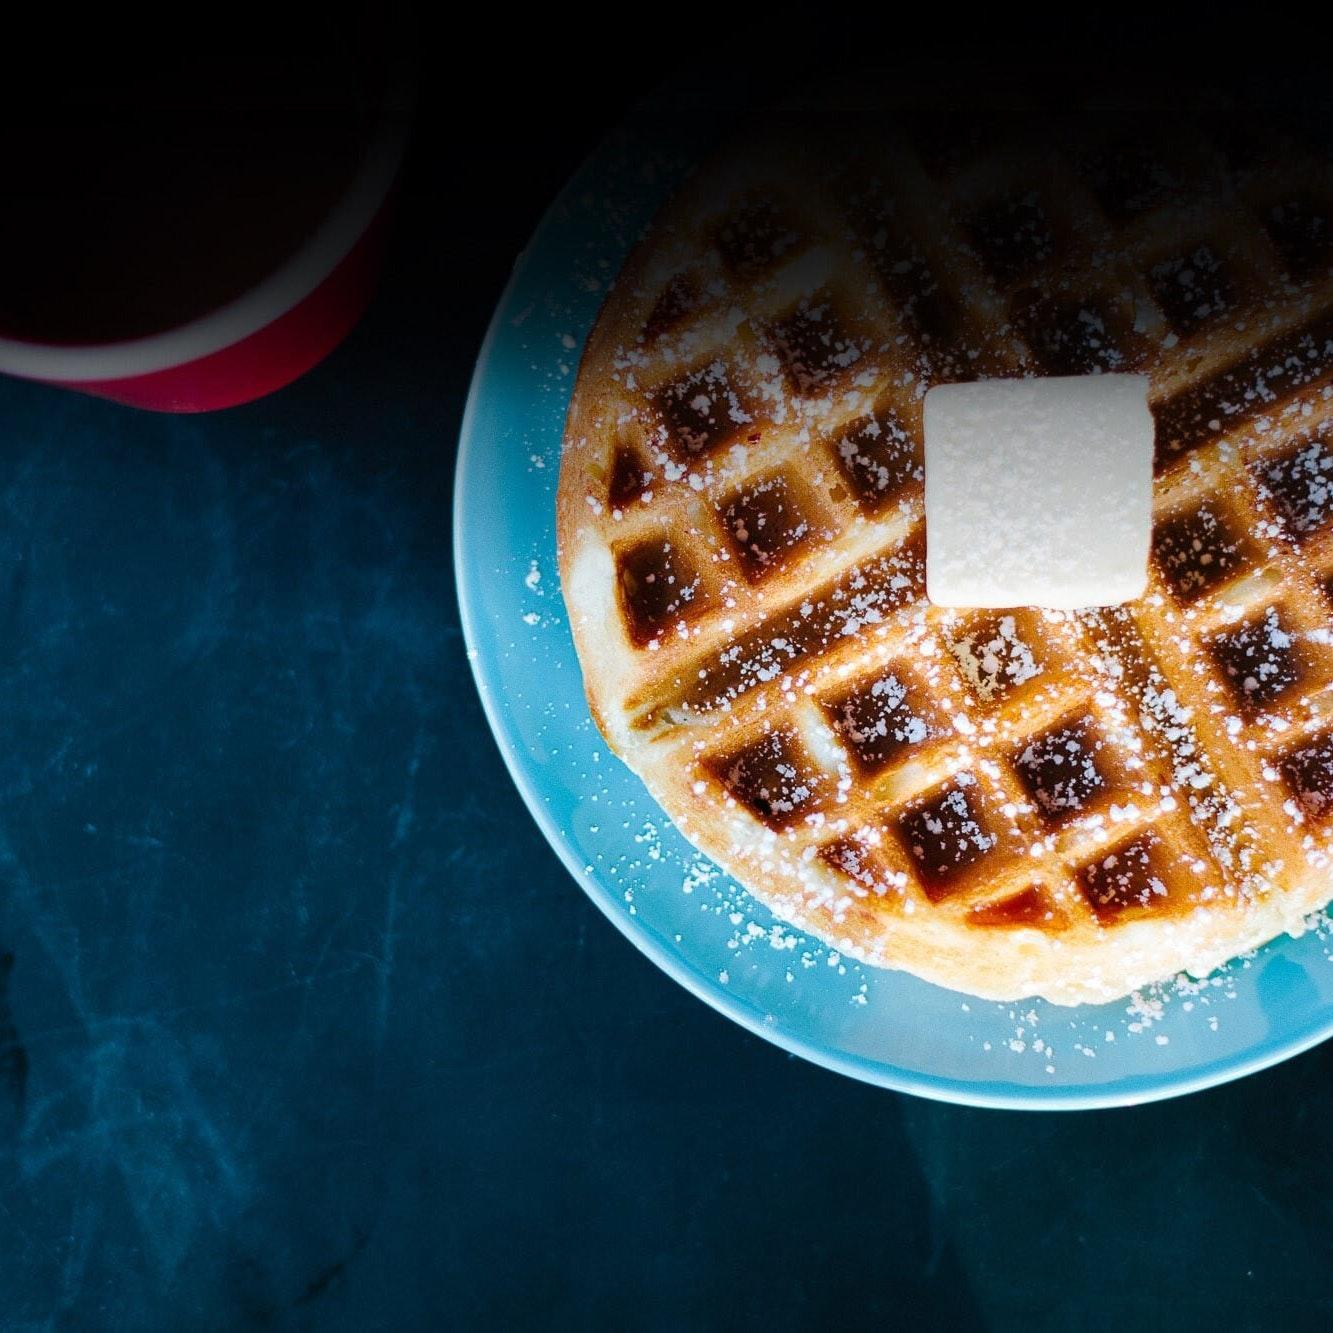 Bebop Waffle Shop